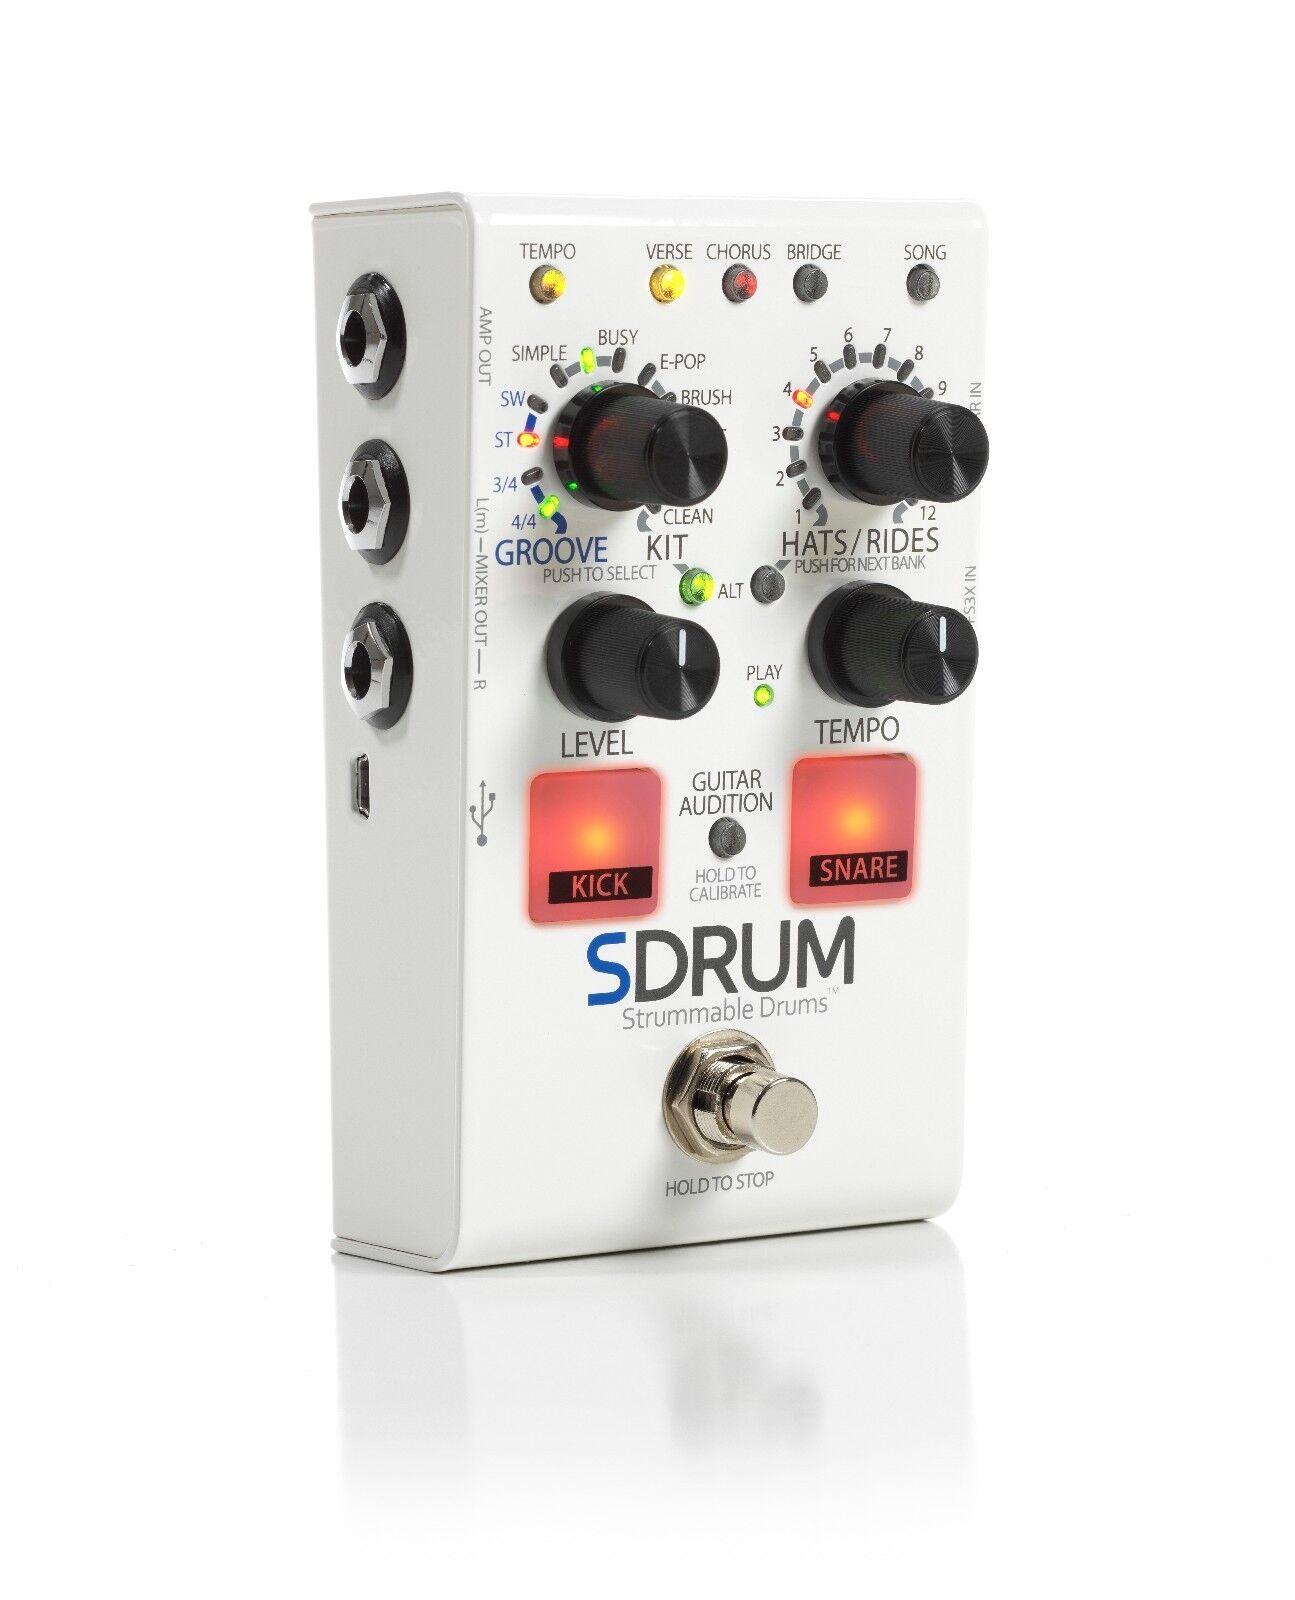 Digitech SDrum Strummable Drums Guitar Pedal w  Power Supply S Drum